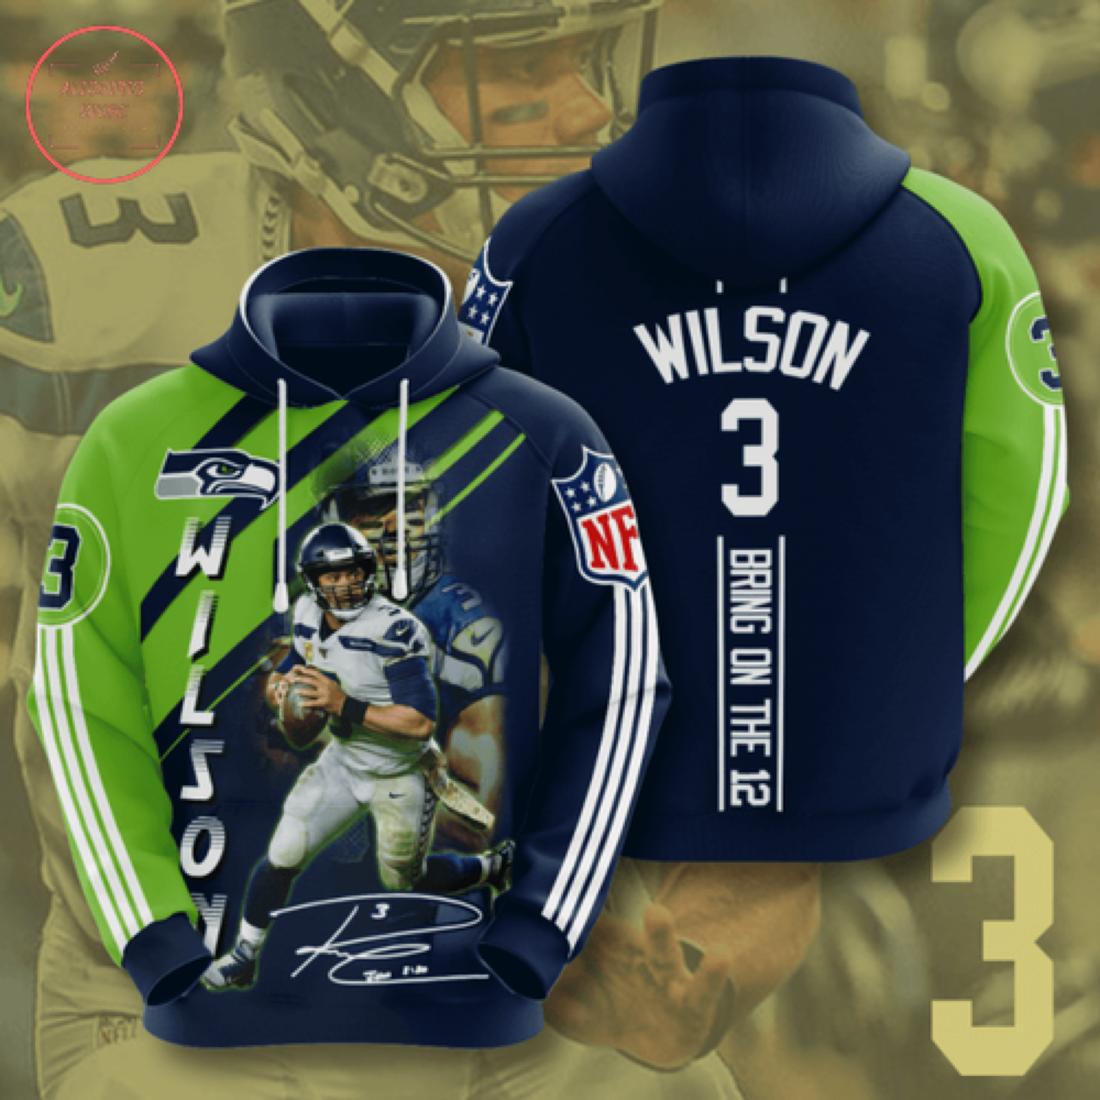 Nfl Seattle Seahawks Personalized Hoodie 3D